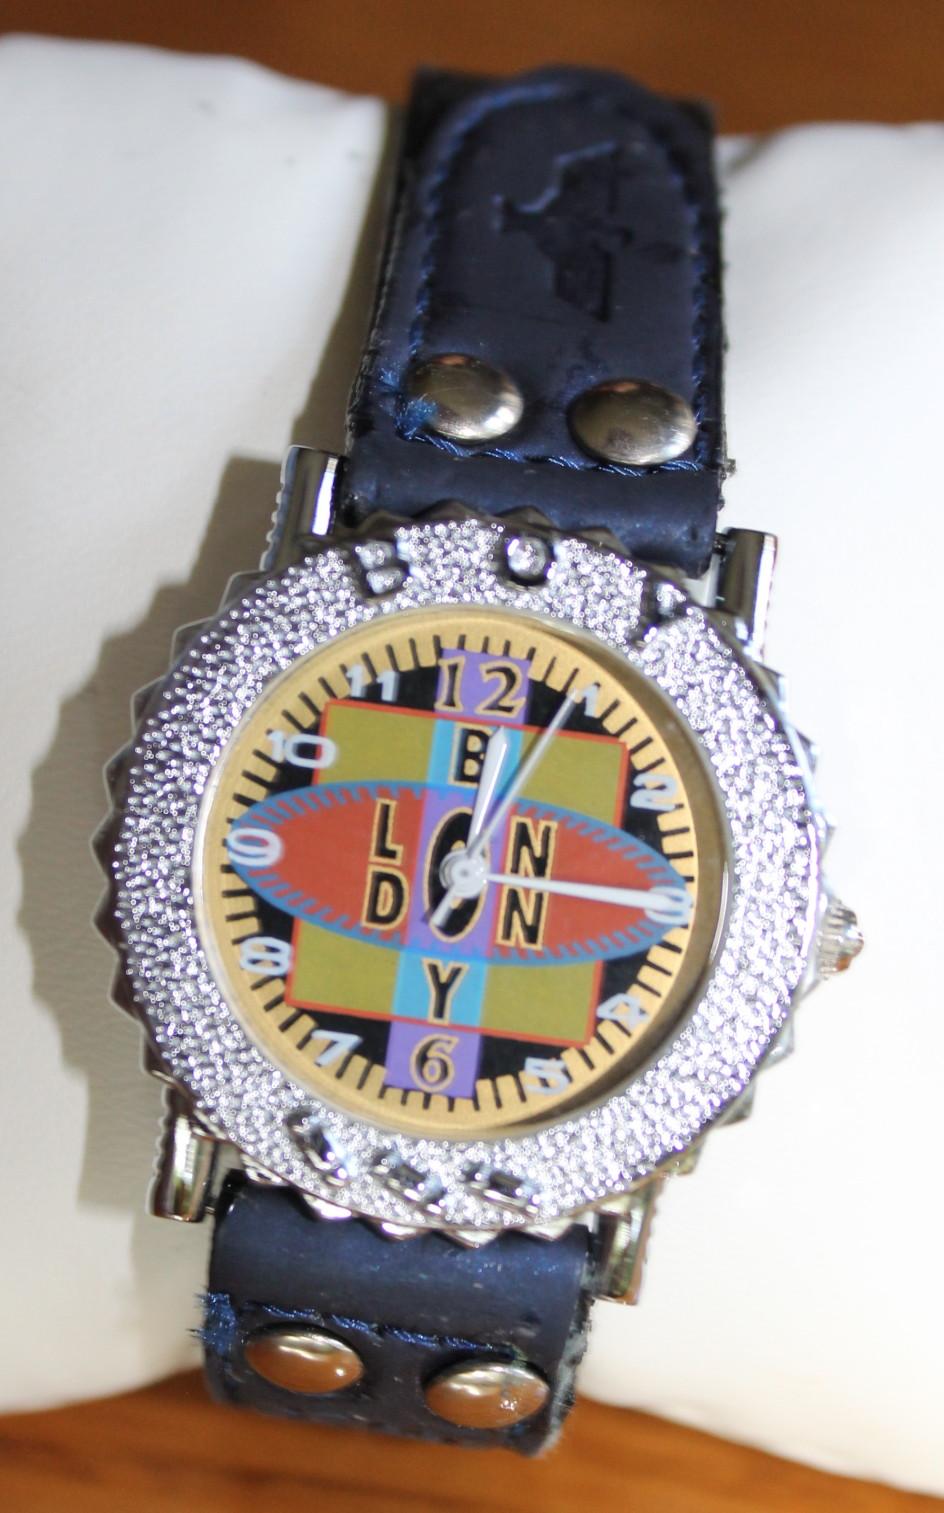 Reloj brazalete mujer vintage retro swarovski n739 - Relojes grandes de pared vintage ...